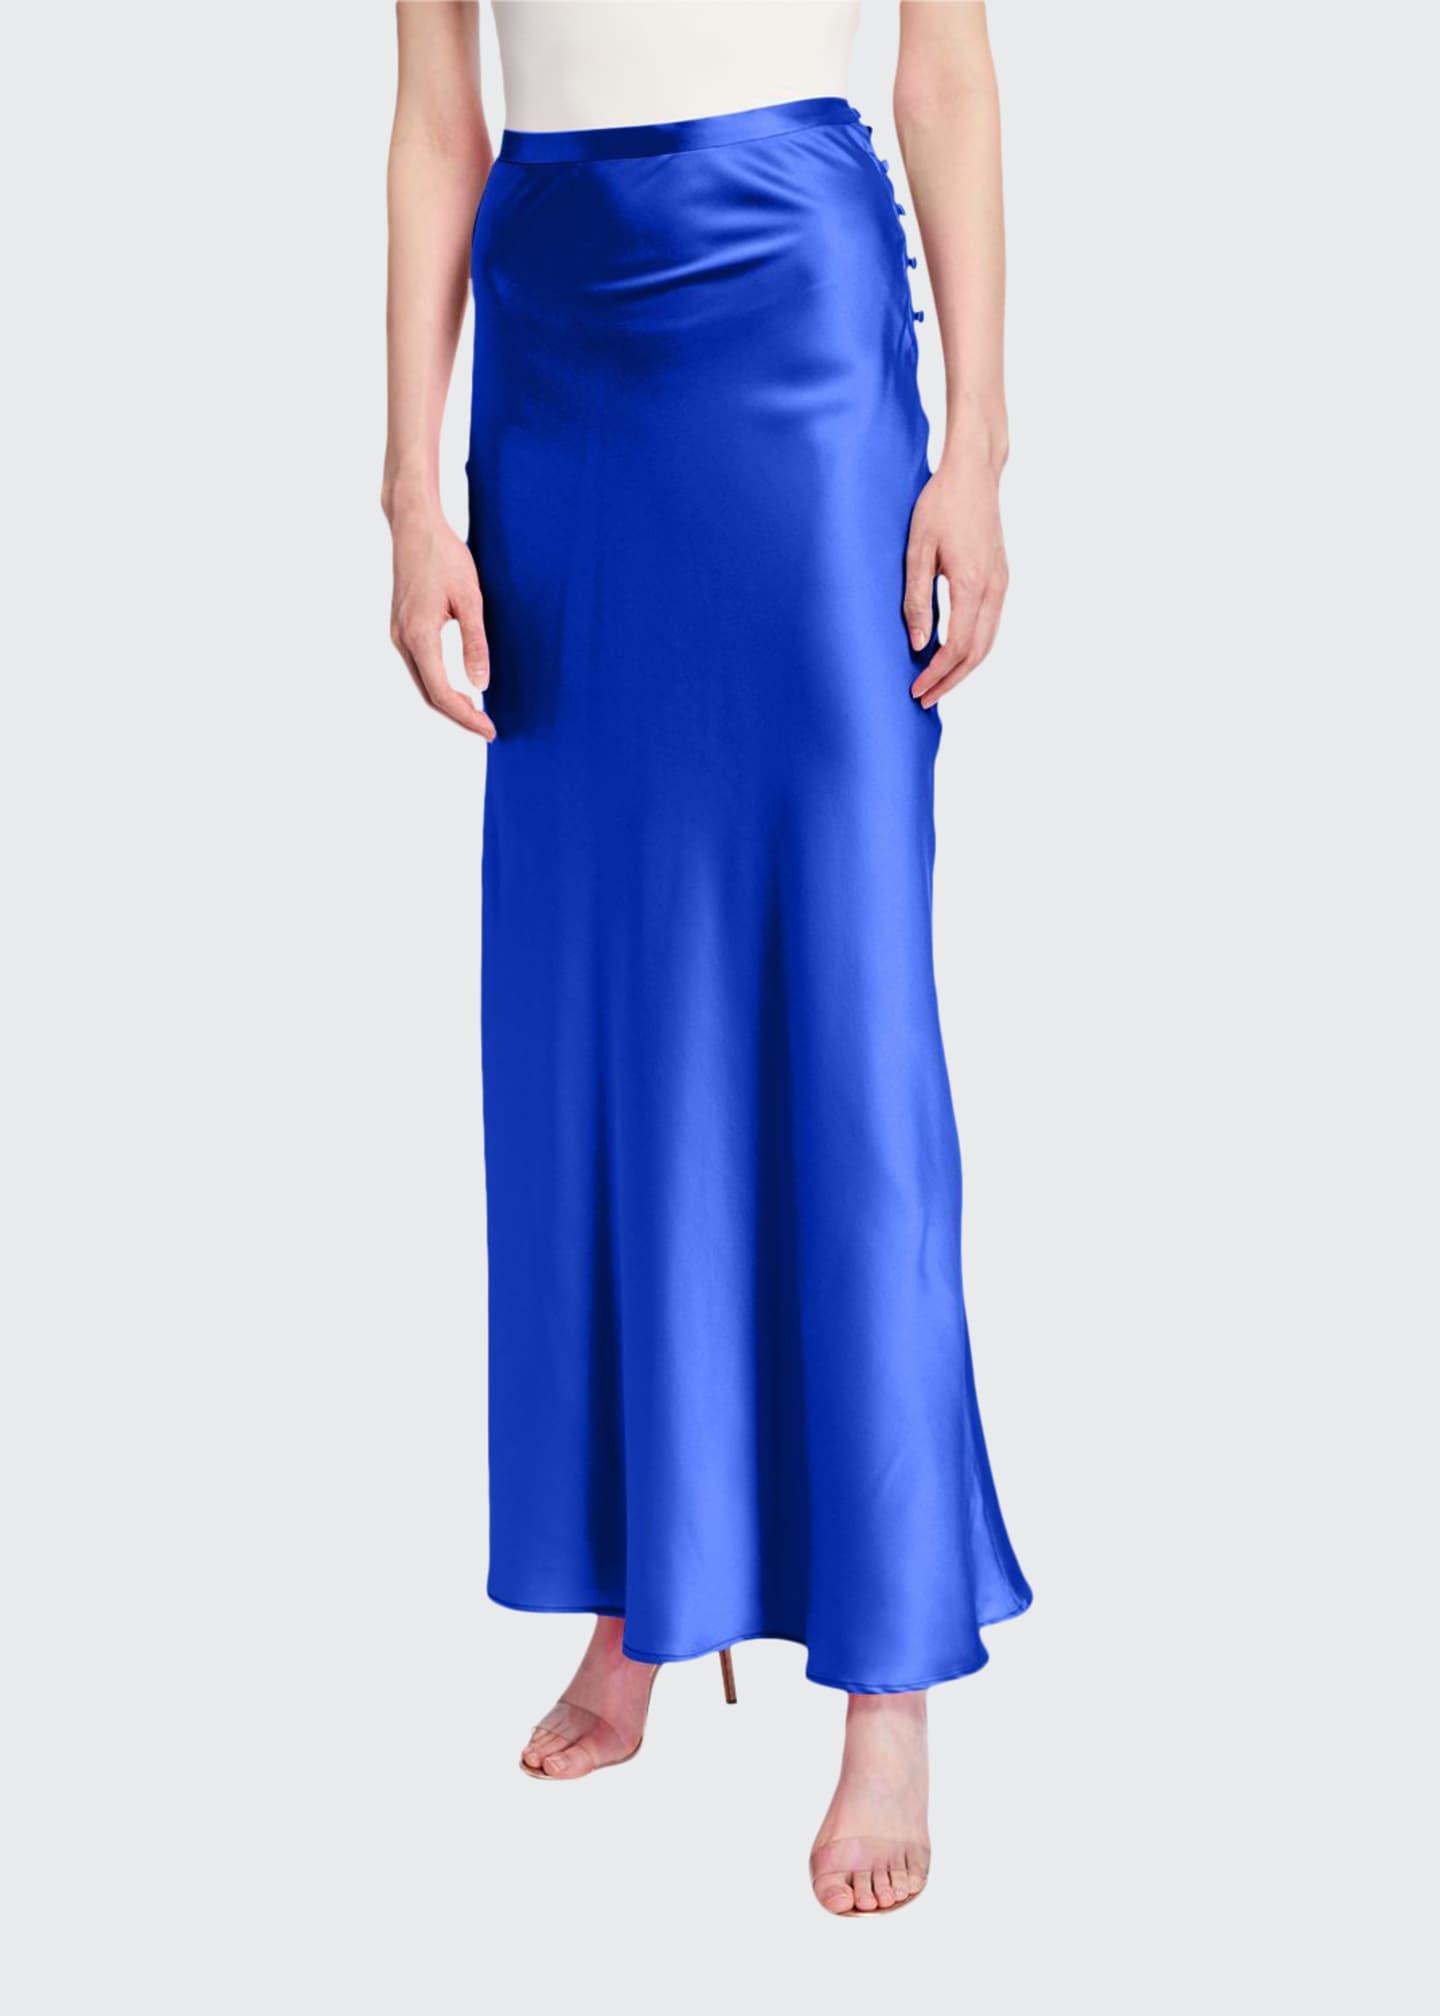 BERNADETTE Florence Silk Satin Bias-Cut Ankle-Length Skirt